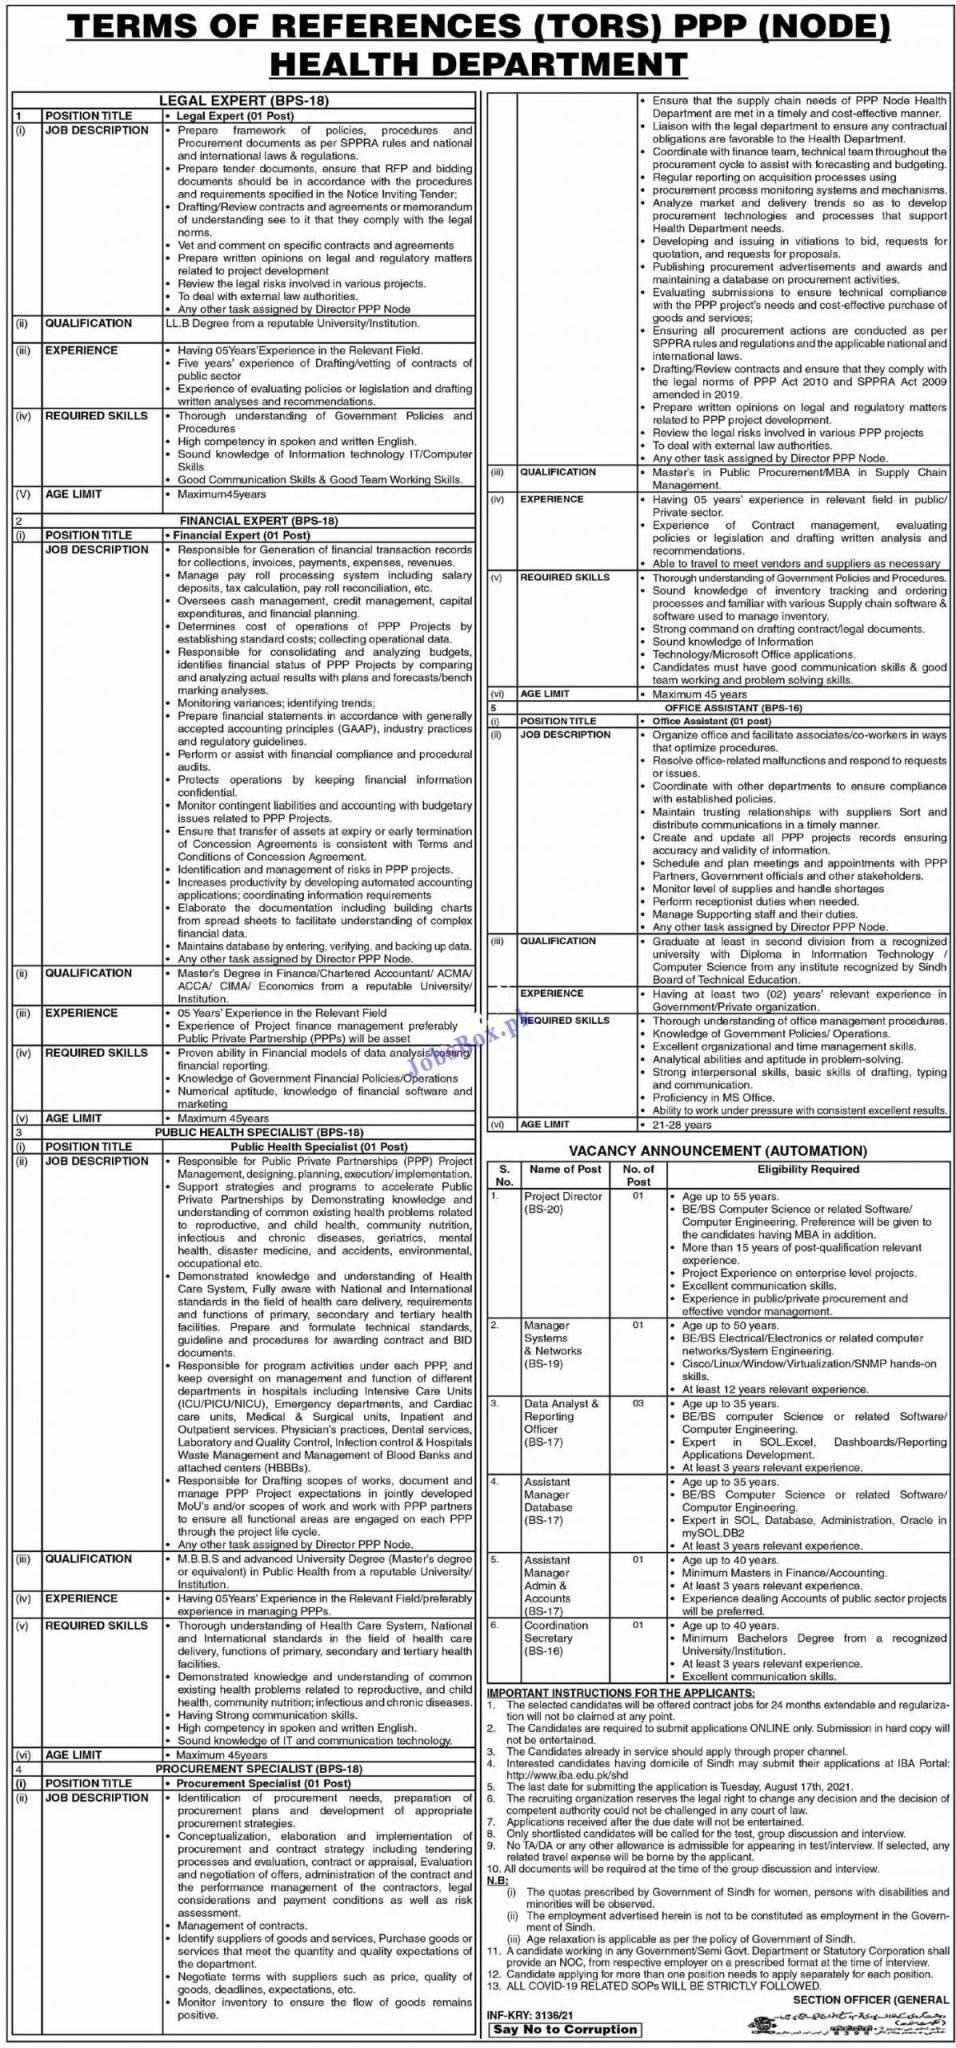 Health Department Sindh Jobs 2021 – Public Private Partnership PPP Node Jobs